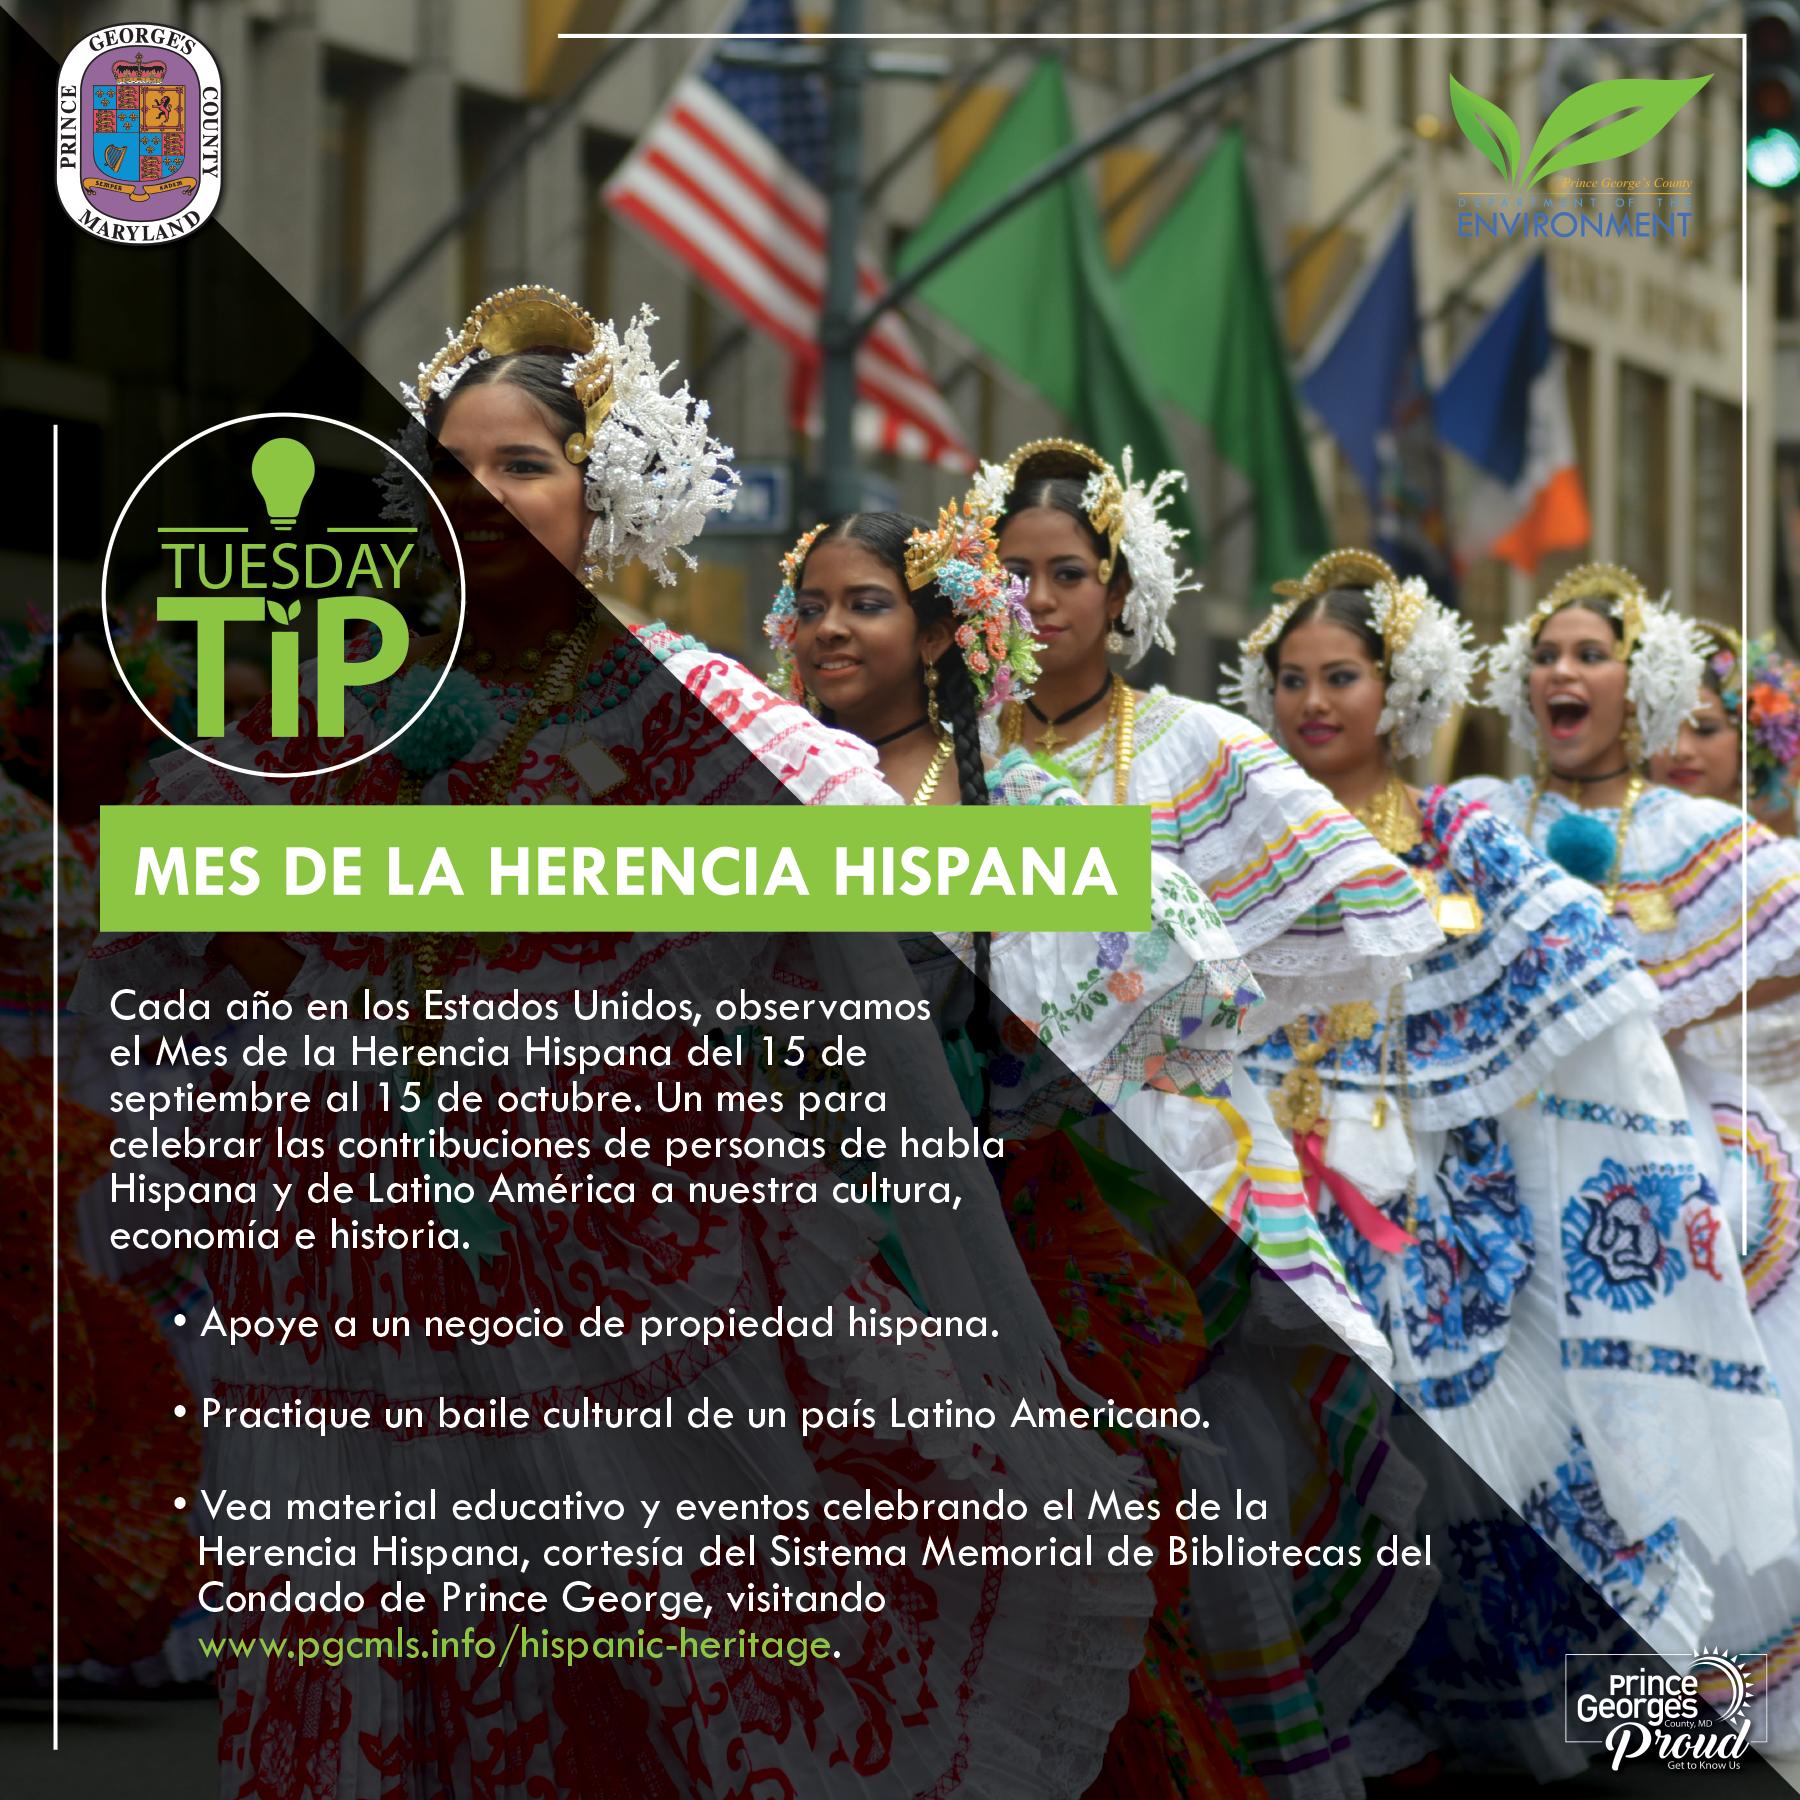 Tues Tip 9.21.21 Hispanic month sp